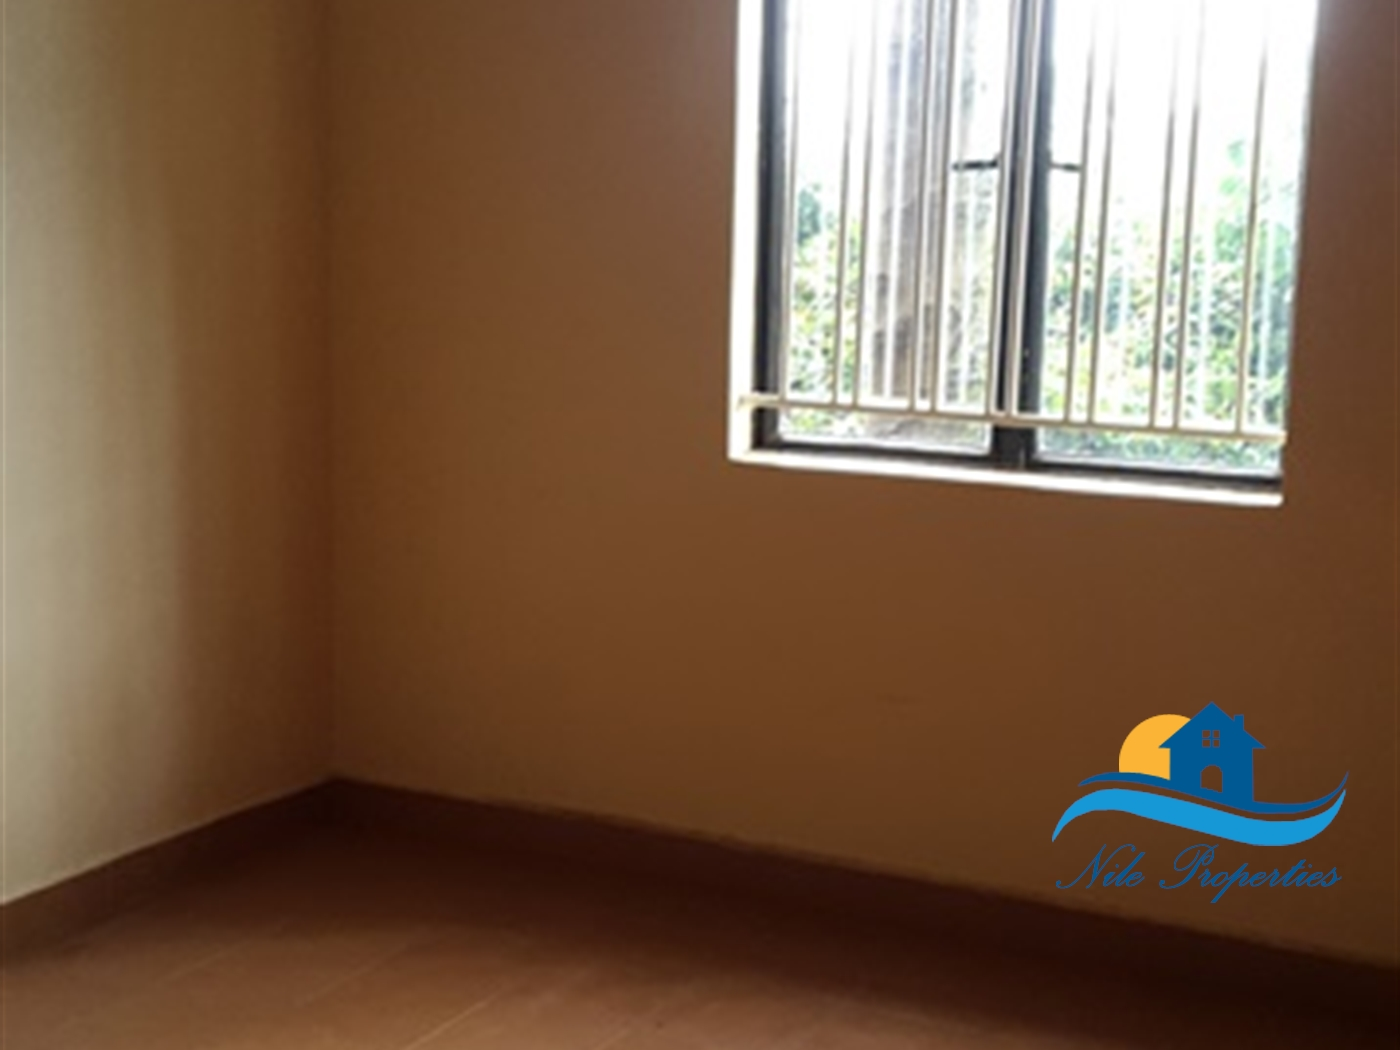 Apartment for rent in Nalufenya Jinja